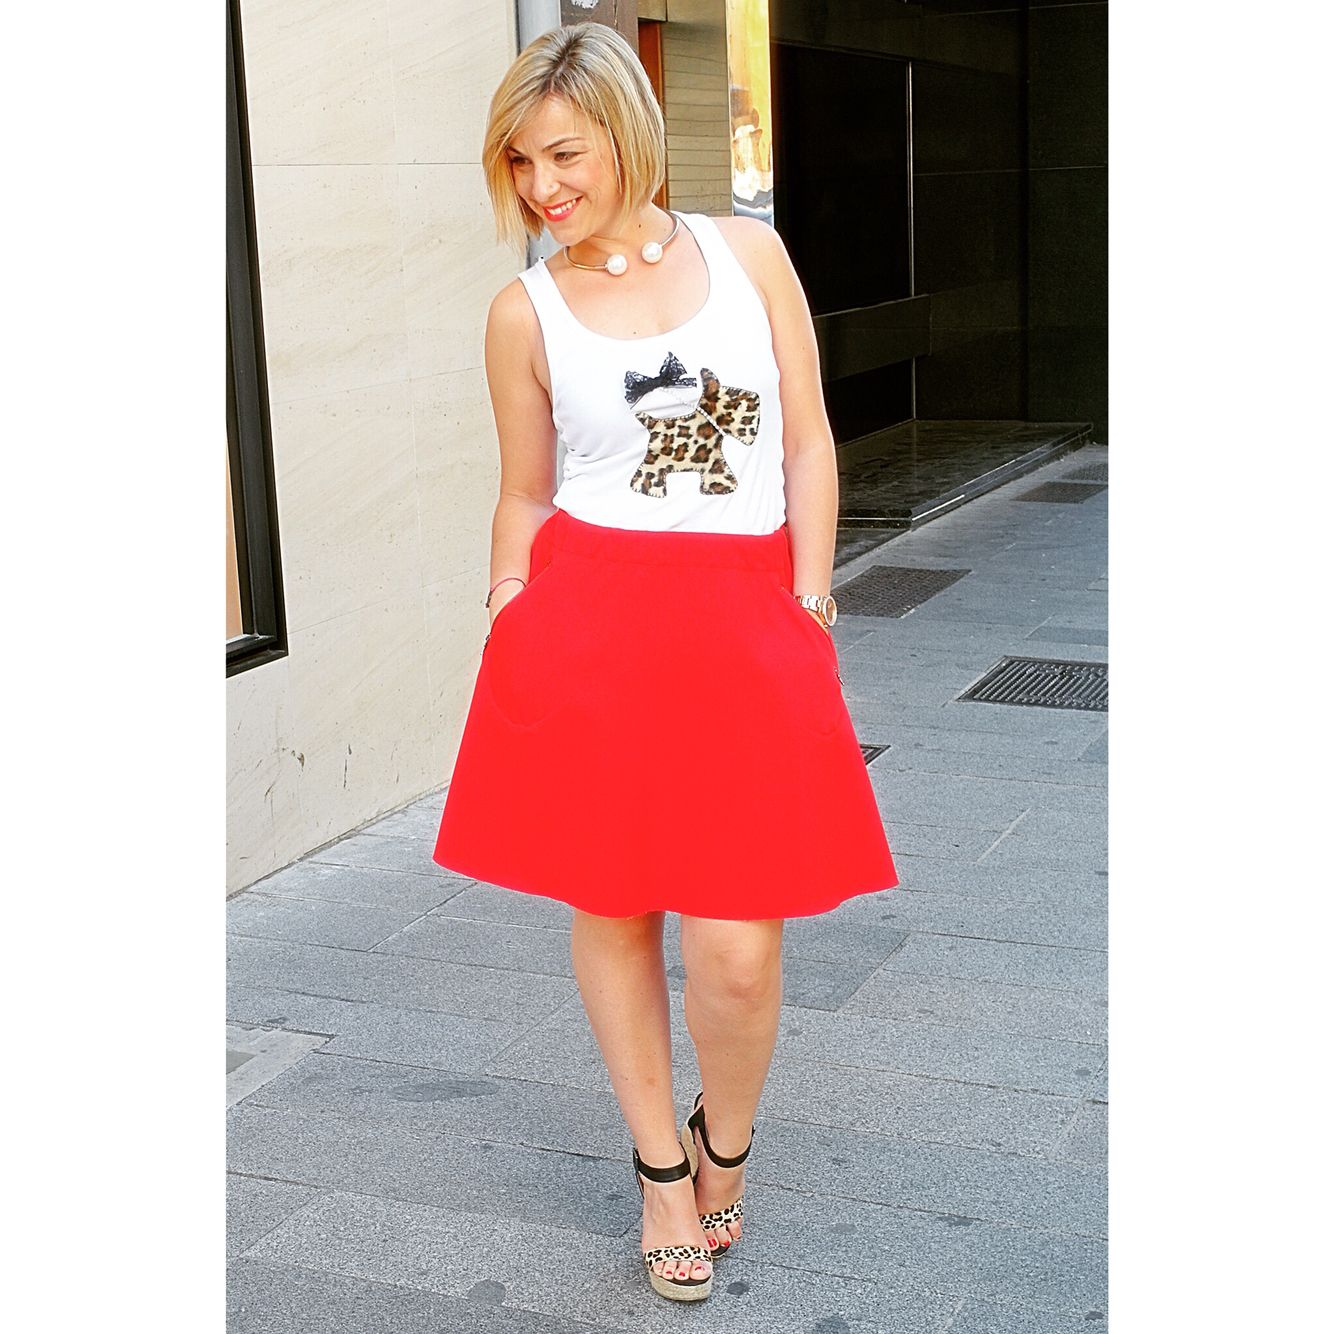 Buenos días.. New post up!! #angycloset #moda #tendencias #blog #blogger #blogdemodalogroño #fashion #fashionblogger #outfit #outfit4you #outfitdeldia #outfitoftheday #style #streetstyle #streetstyledeluxe #stylelogroño @kissmylook @zaraofficial @suiteblanco